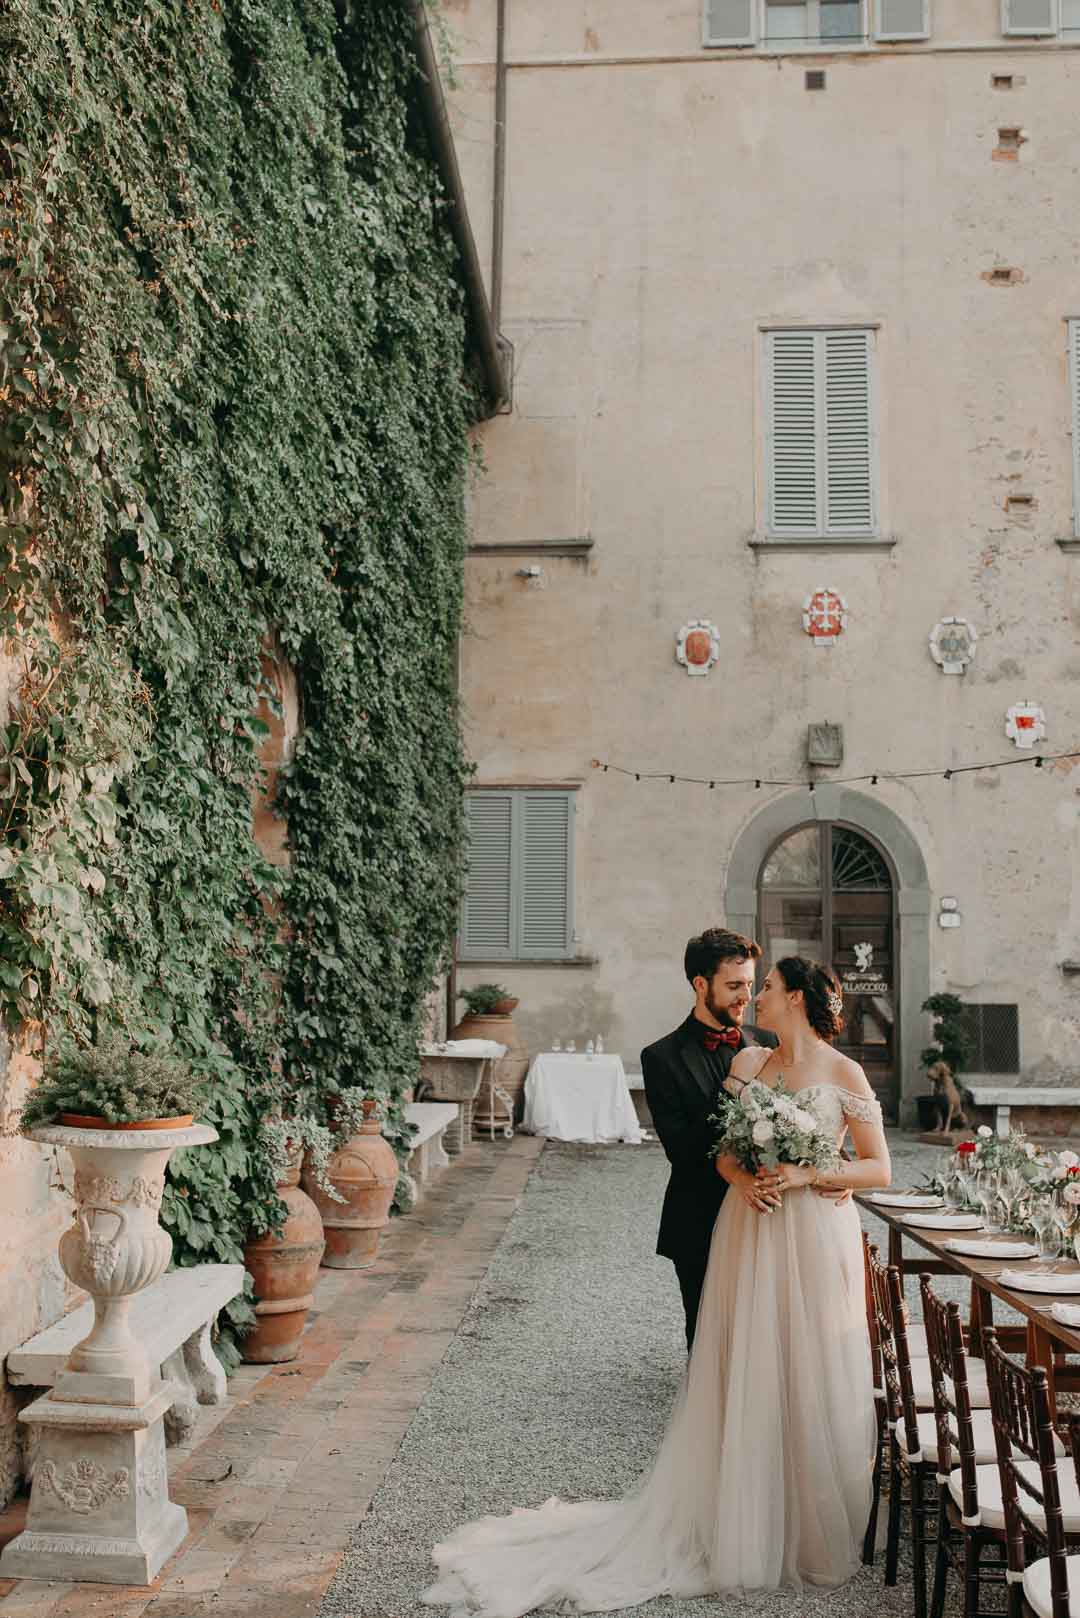 wedding-photographer-destination-fineart-bespoke-reportage-tuscany-villascorzi-vivianeizzo-spazio46-133